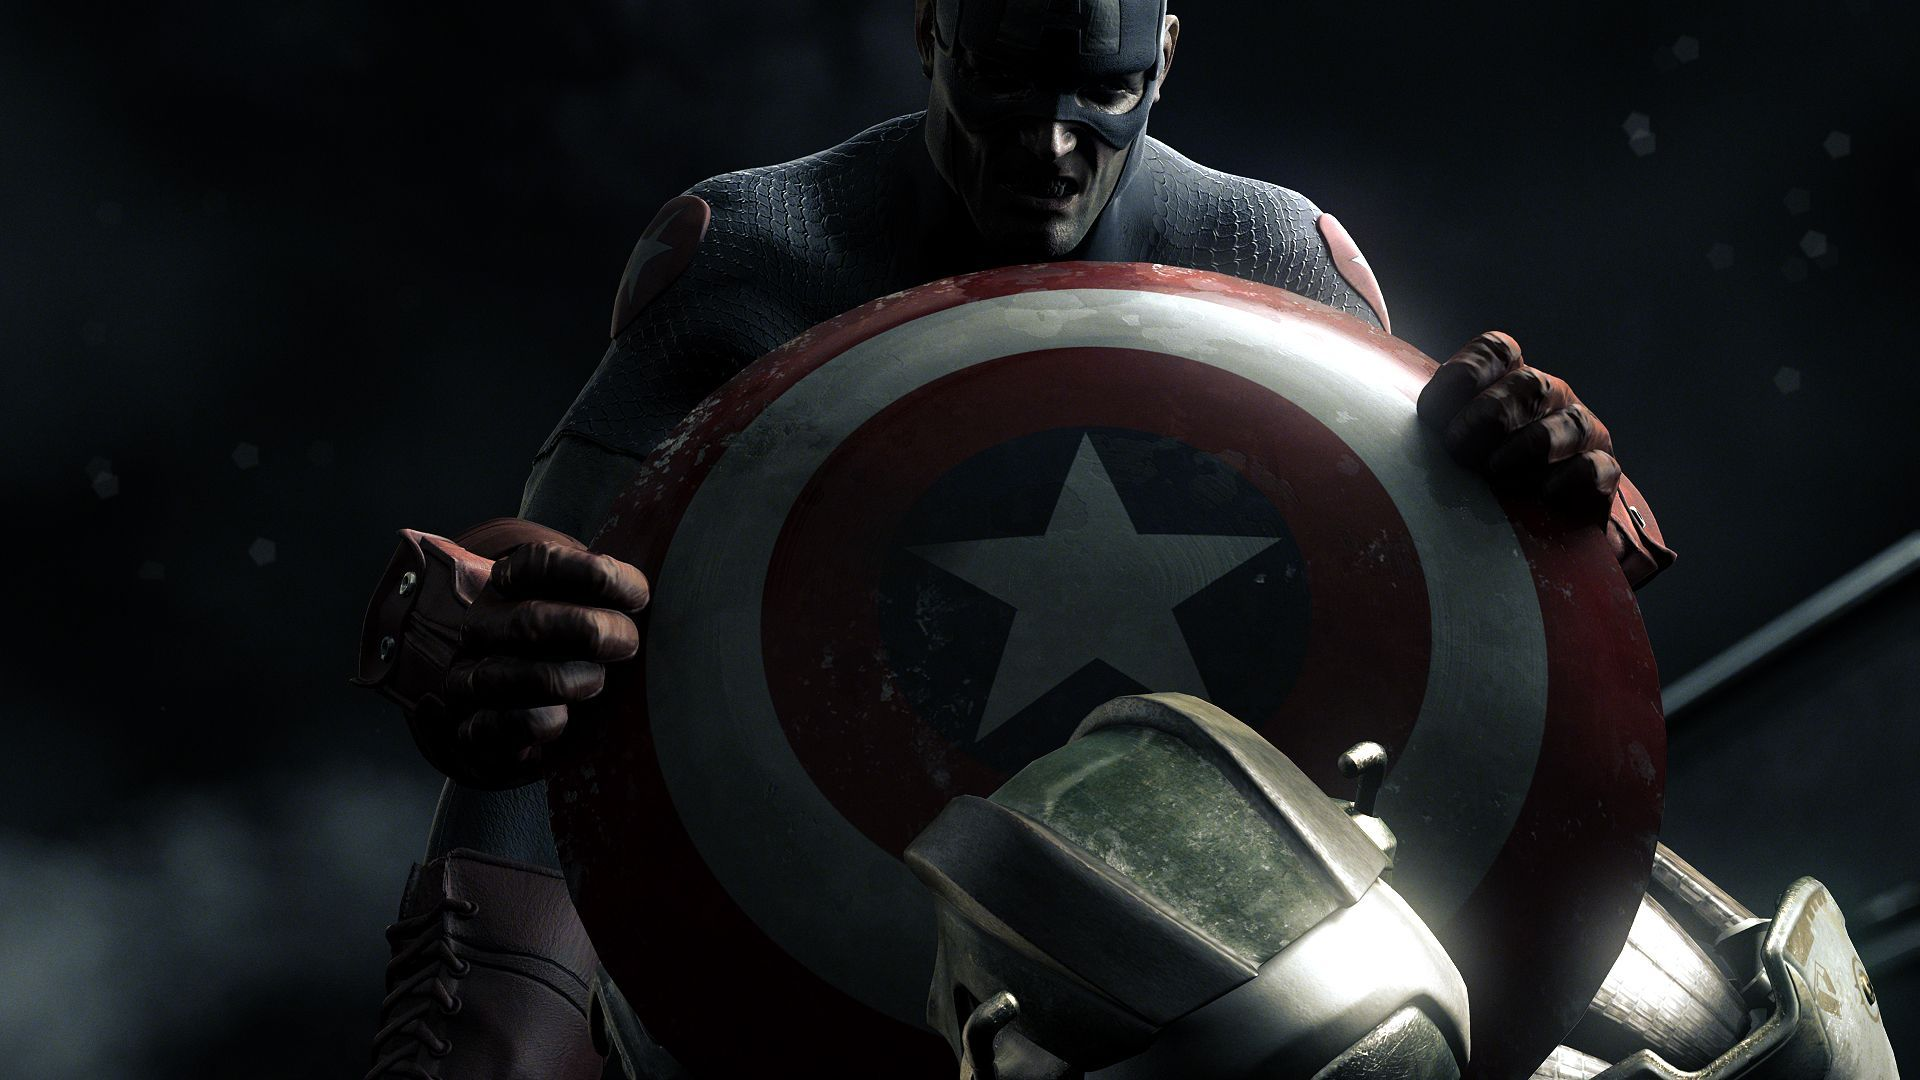 Captain America wallpaper 16553 1920x1080